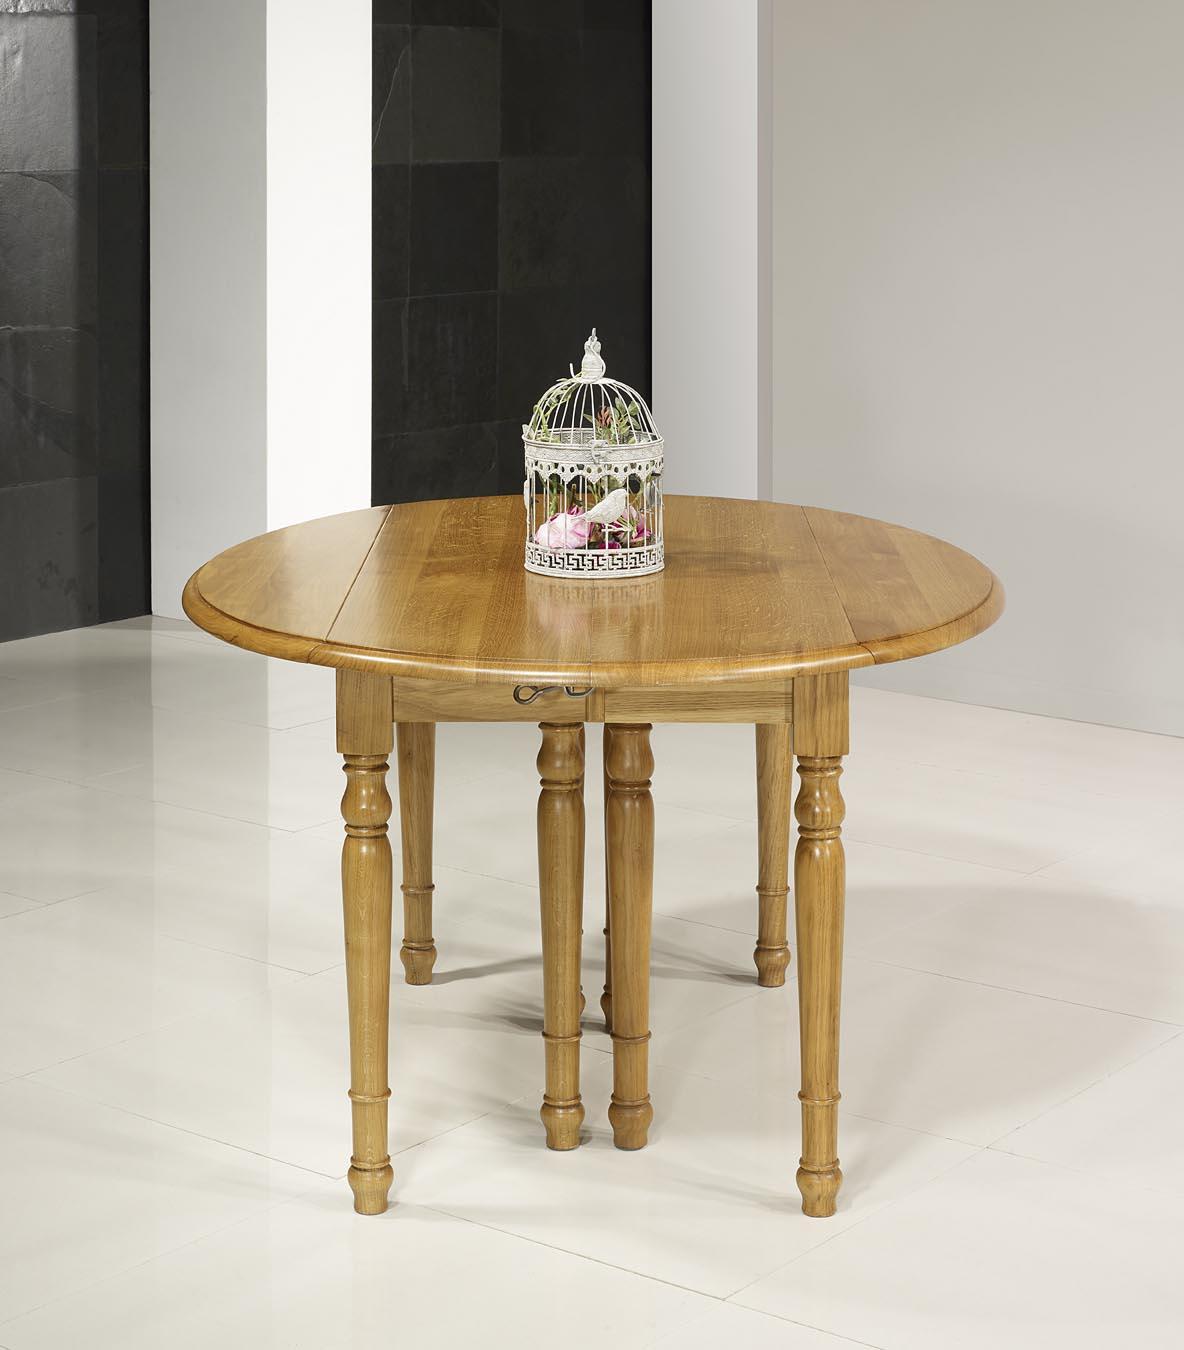 Table ovale volets 135 110 en ch ne massif de style for Table ovale chene massif